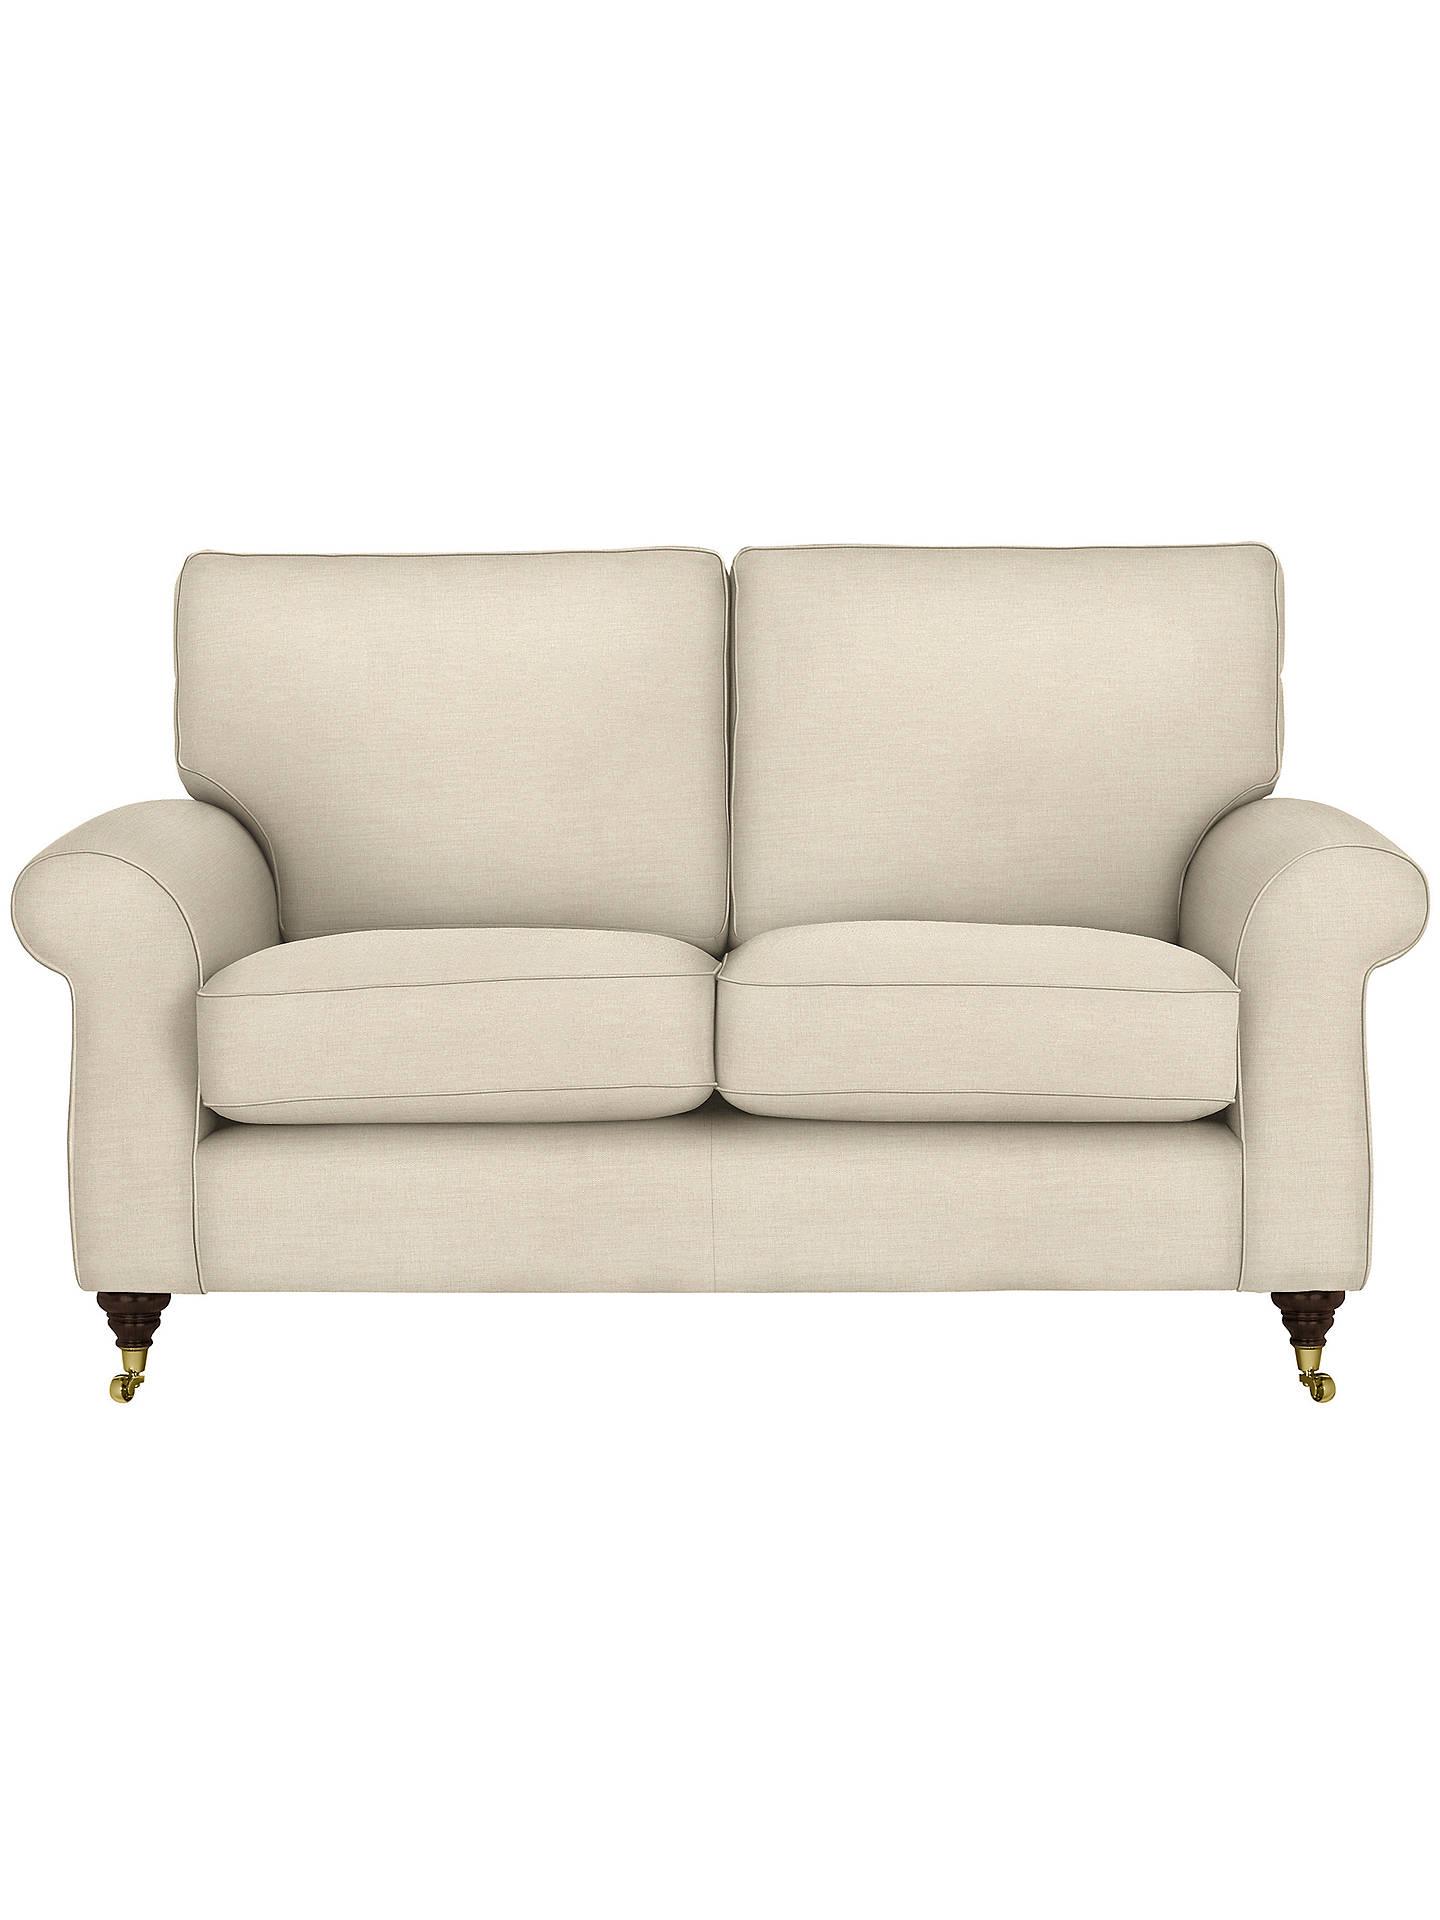 john lewis hannah medium 2 seater sofa castor leg. Black Bedroom Furniture Sets. Home Design Ideas